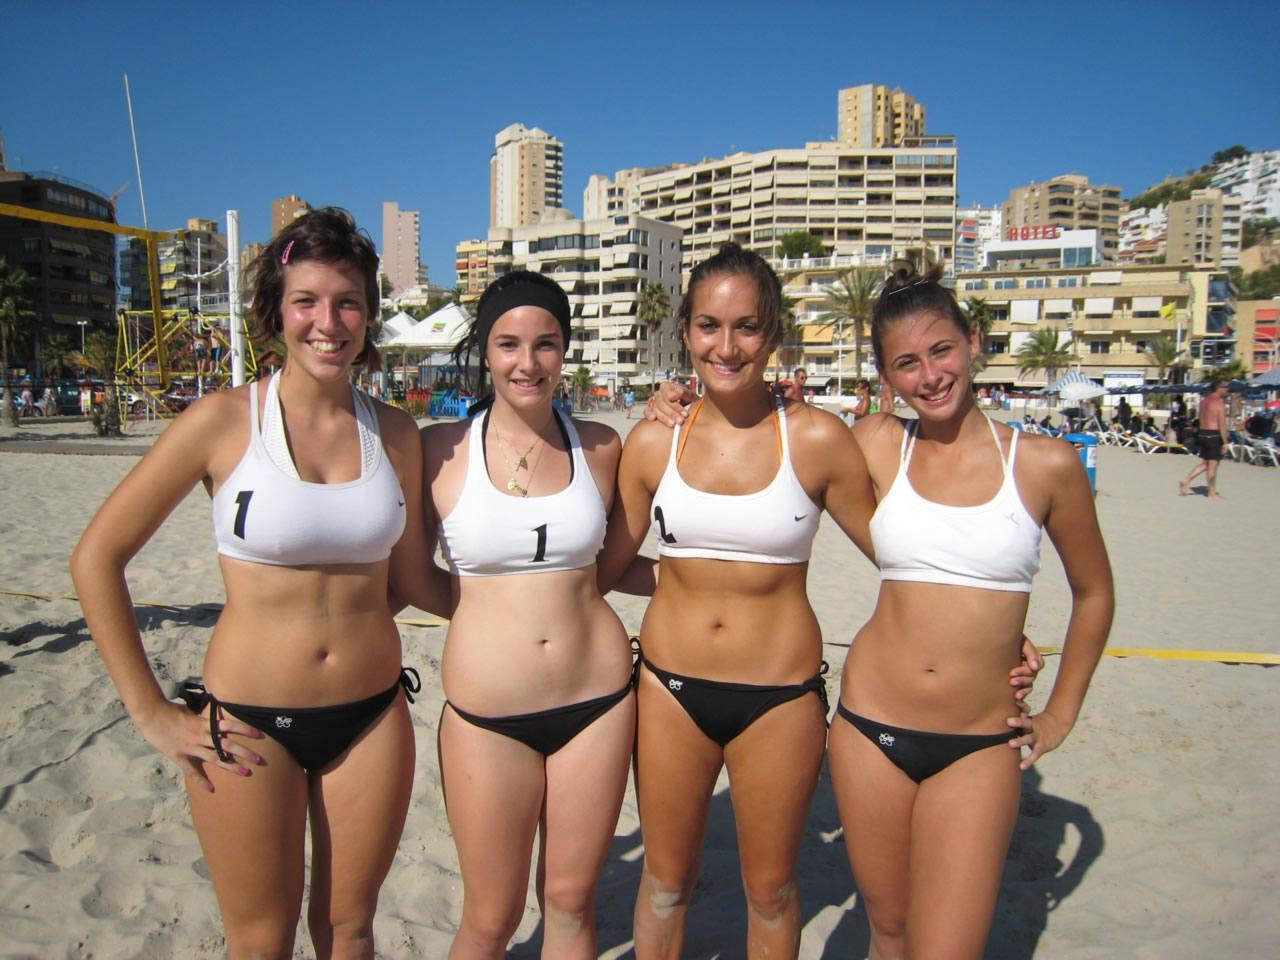 chicas voley playa: